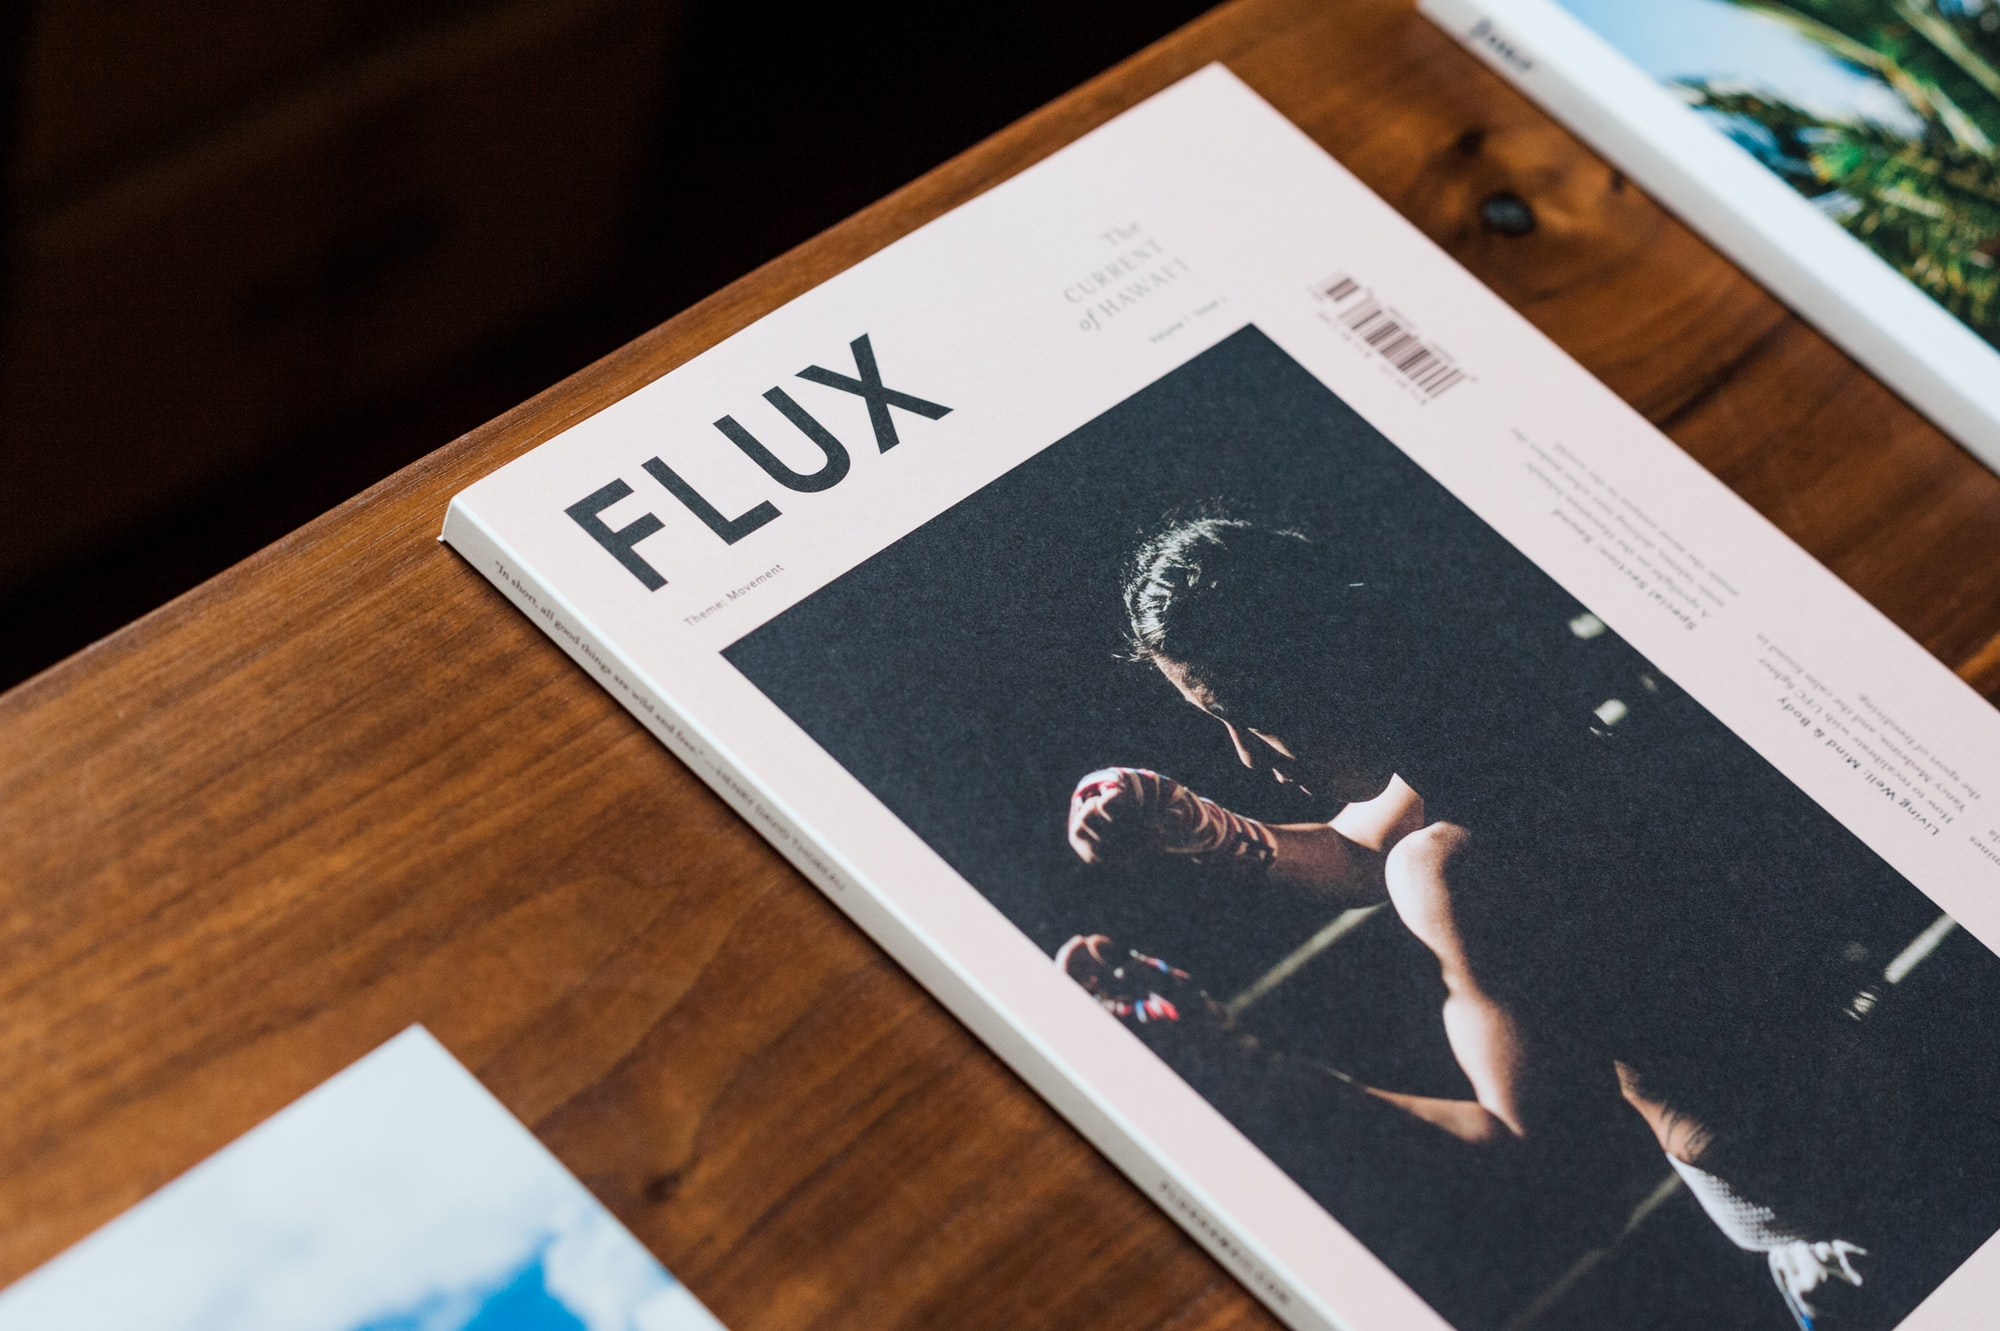 Flux Machine Learning for Julia